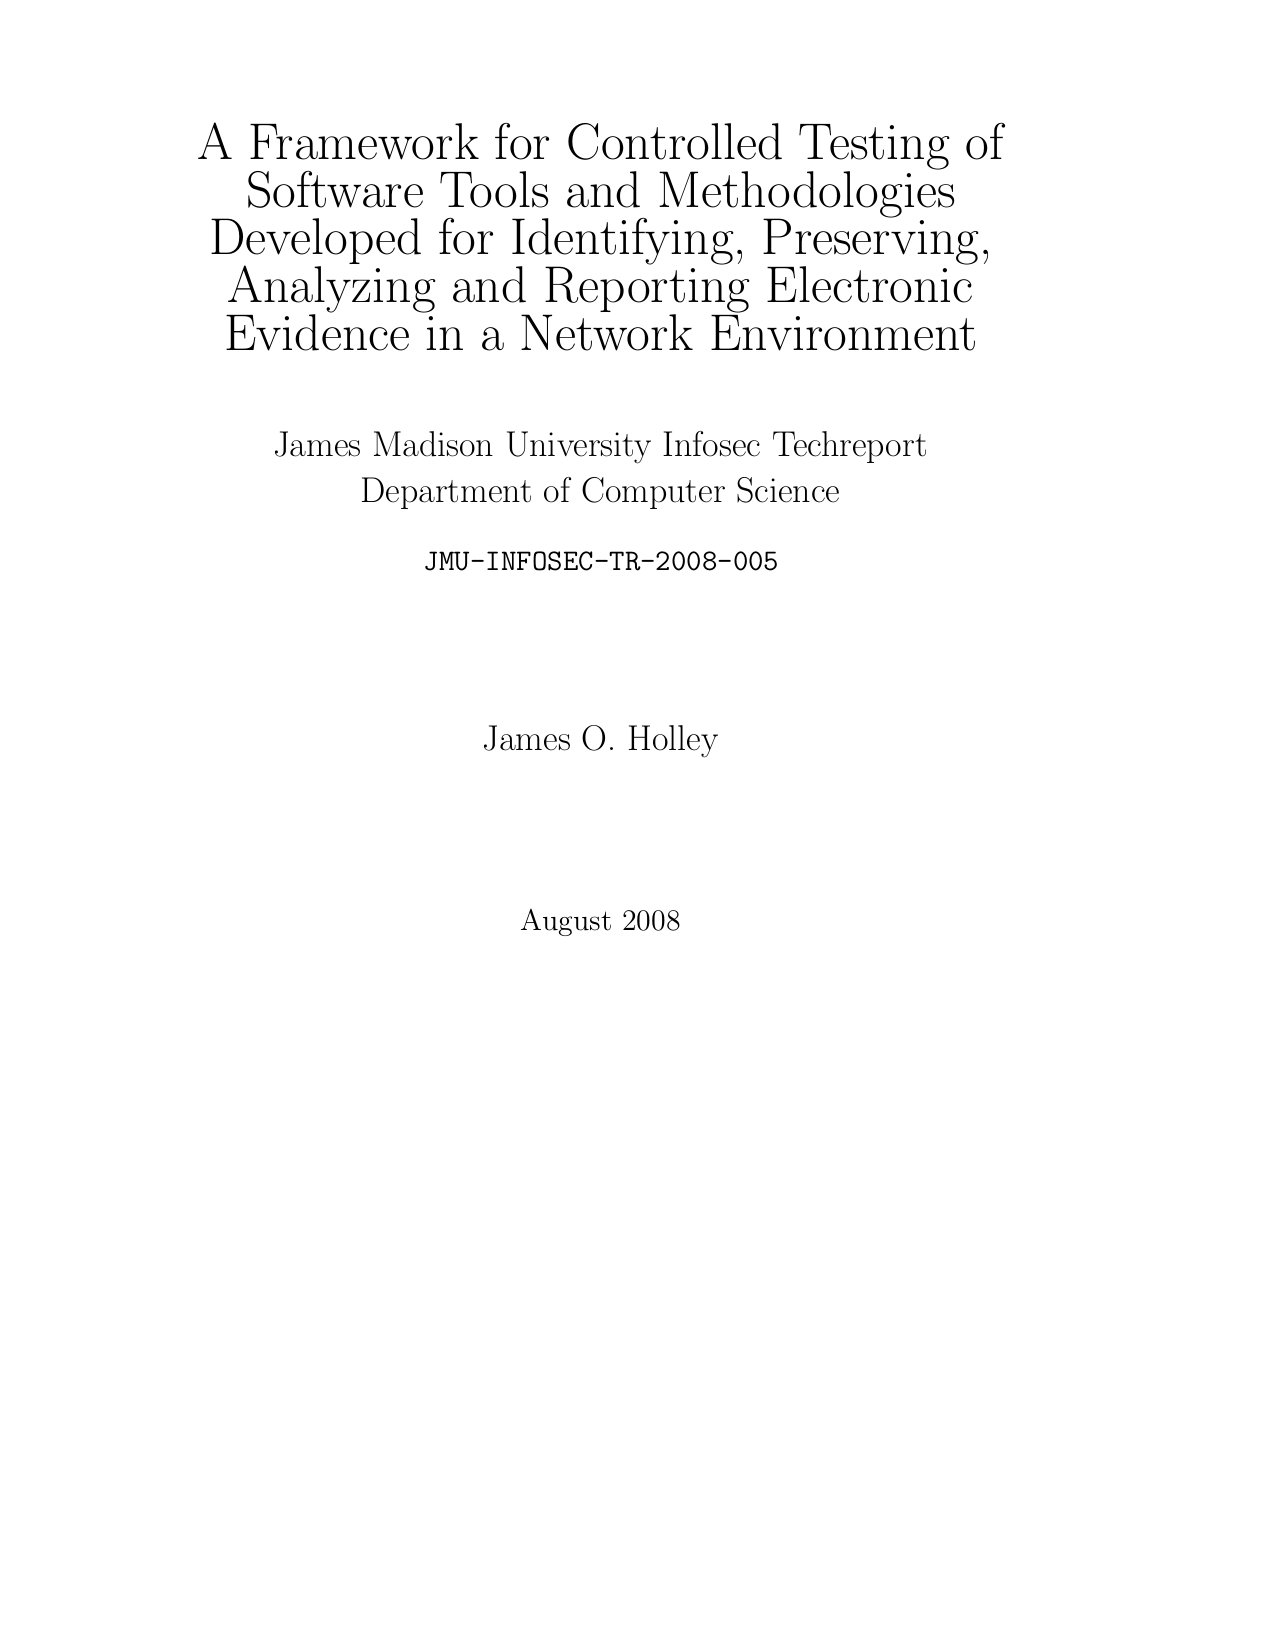 pdf for Wiebetech Storage DU8-0 manual